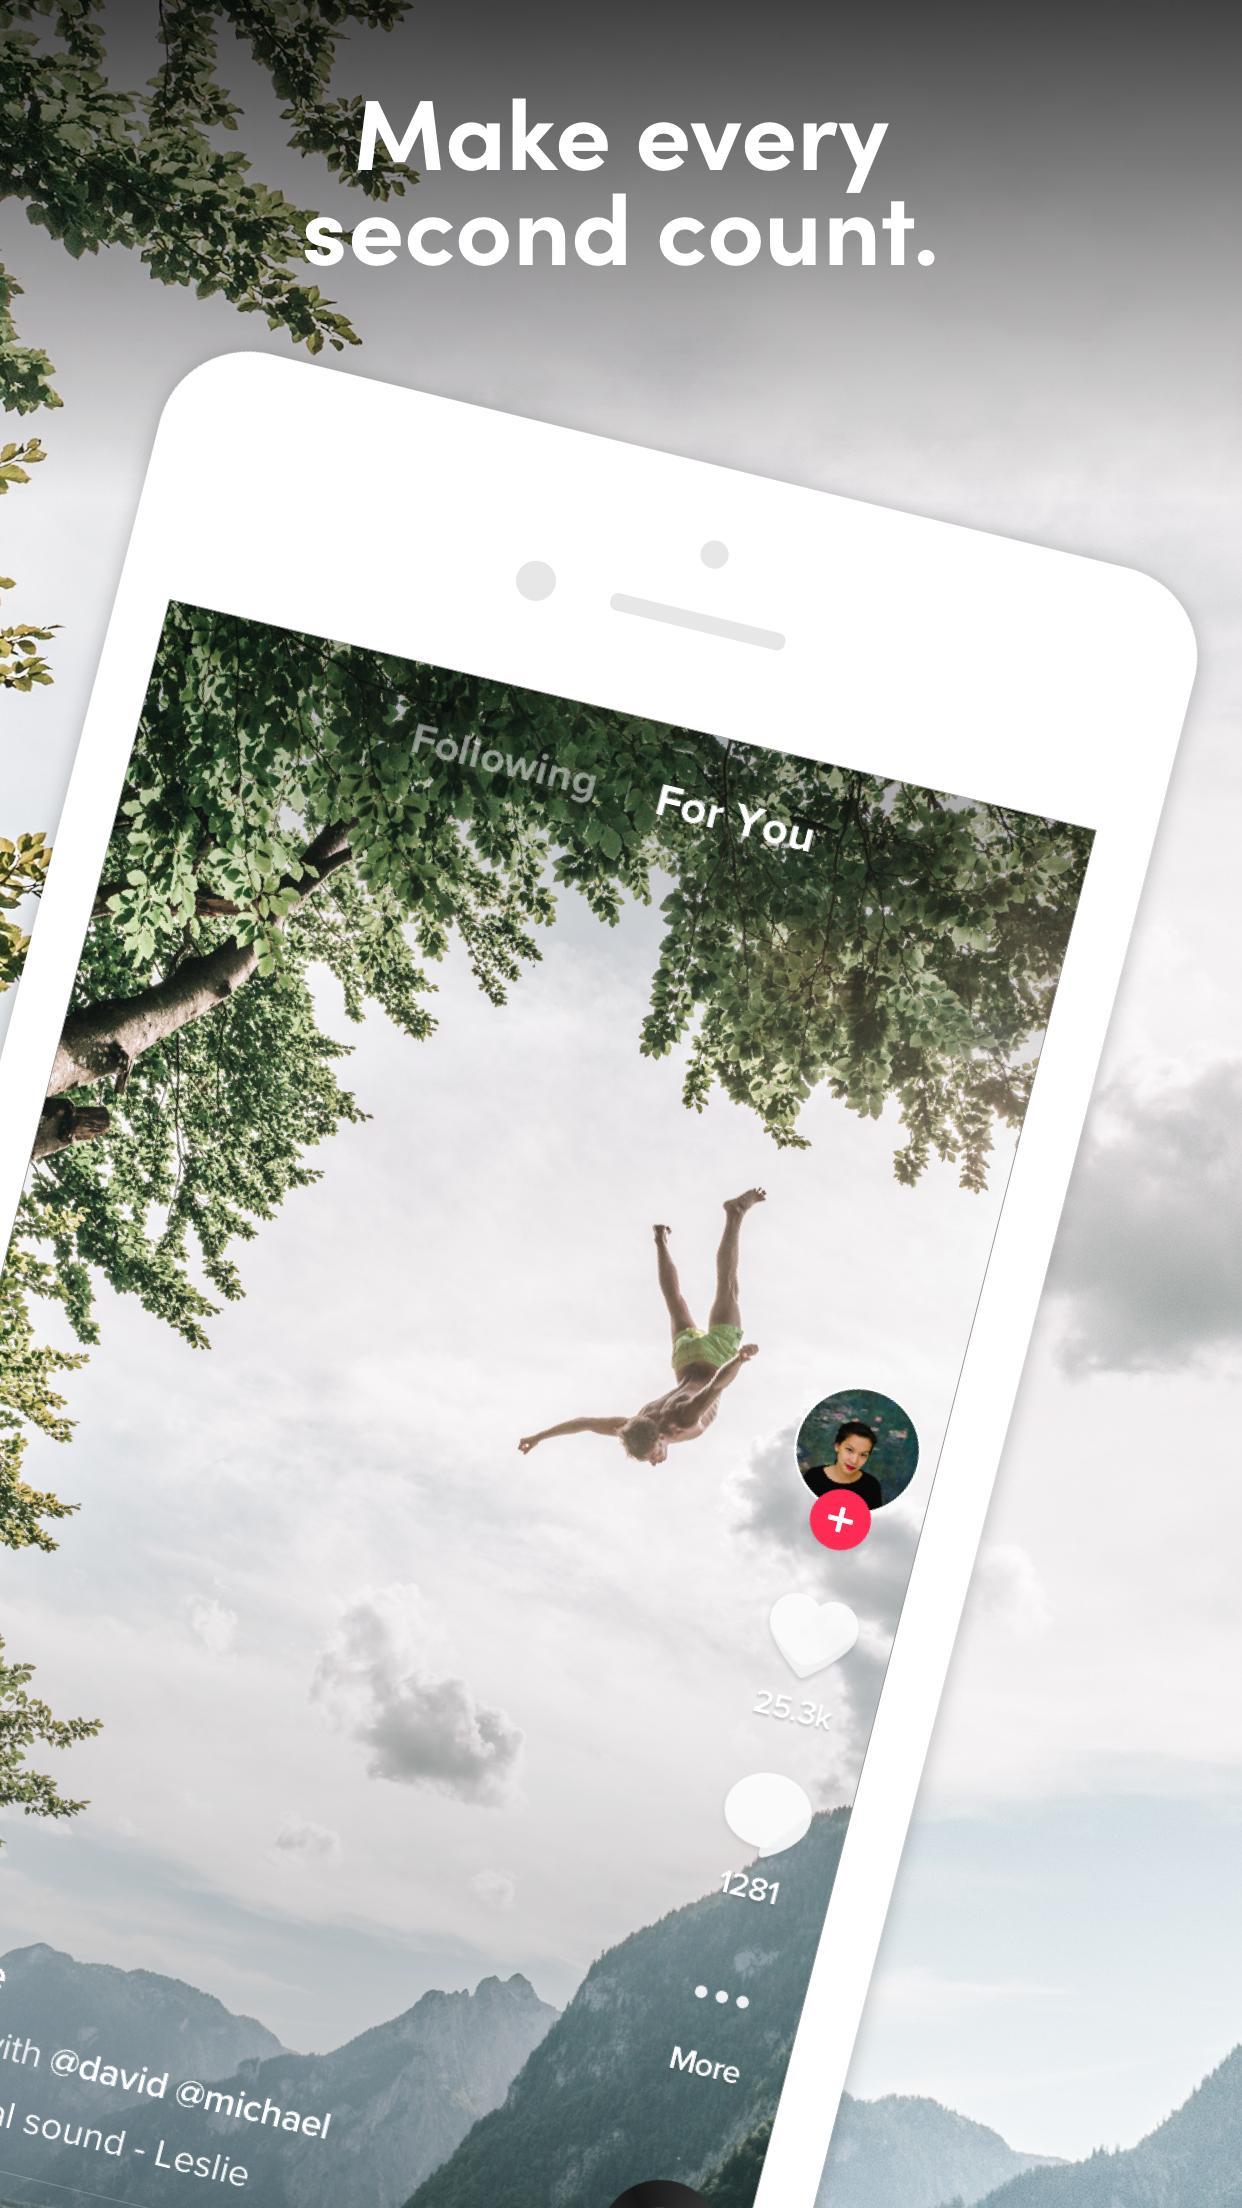 Tiktok Apk For Android Latest Apk Download Apkmirror